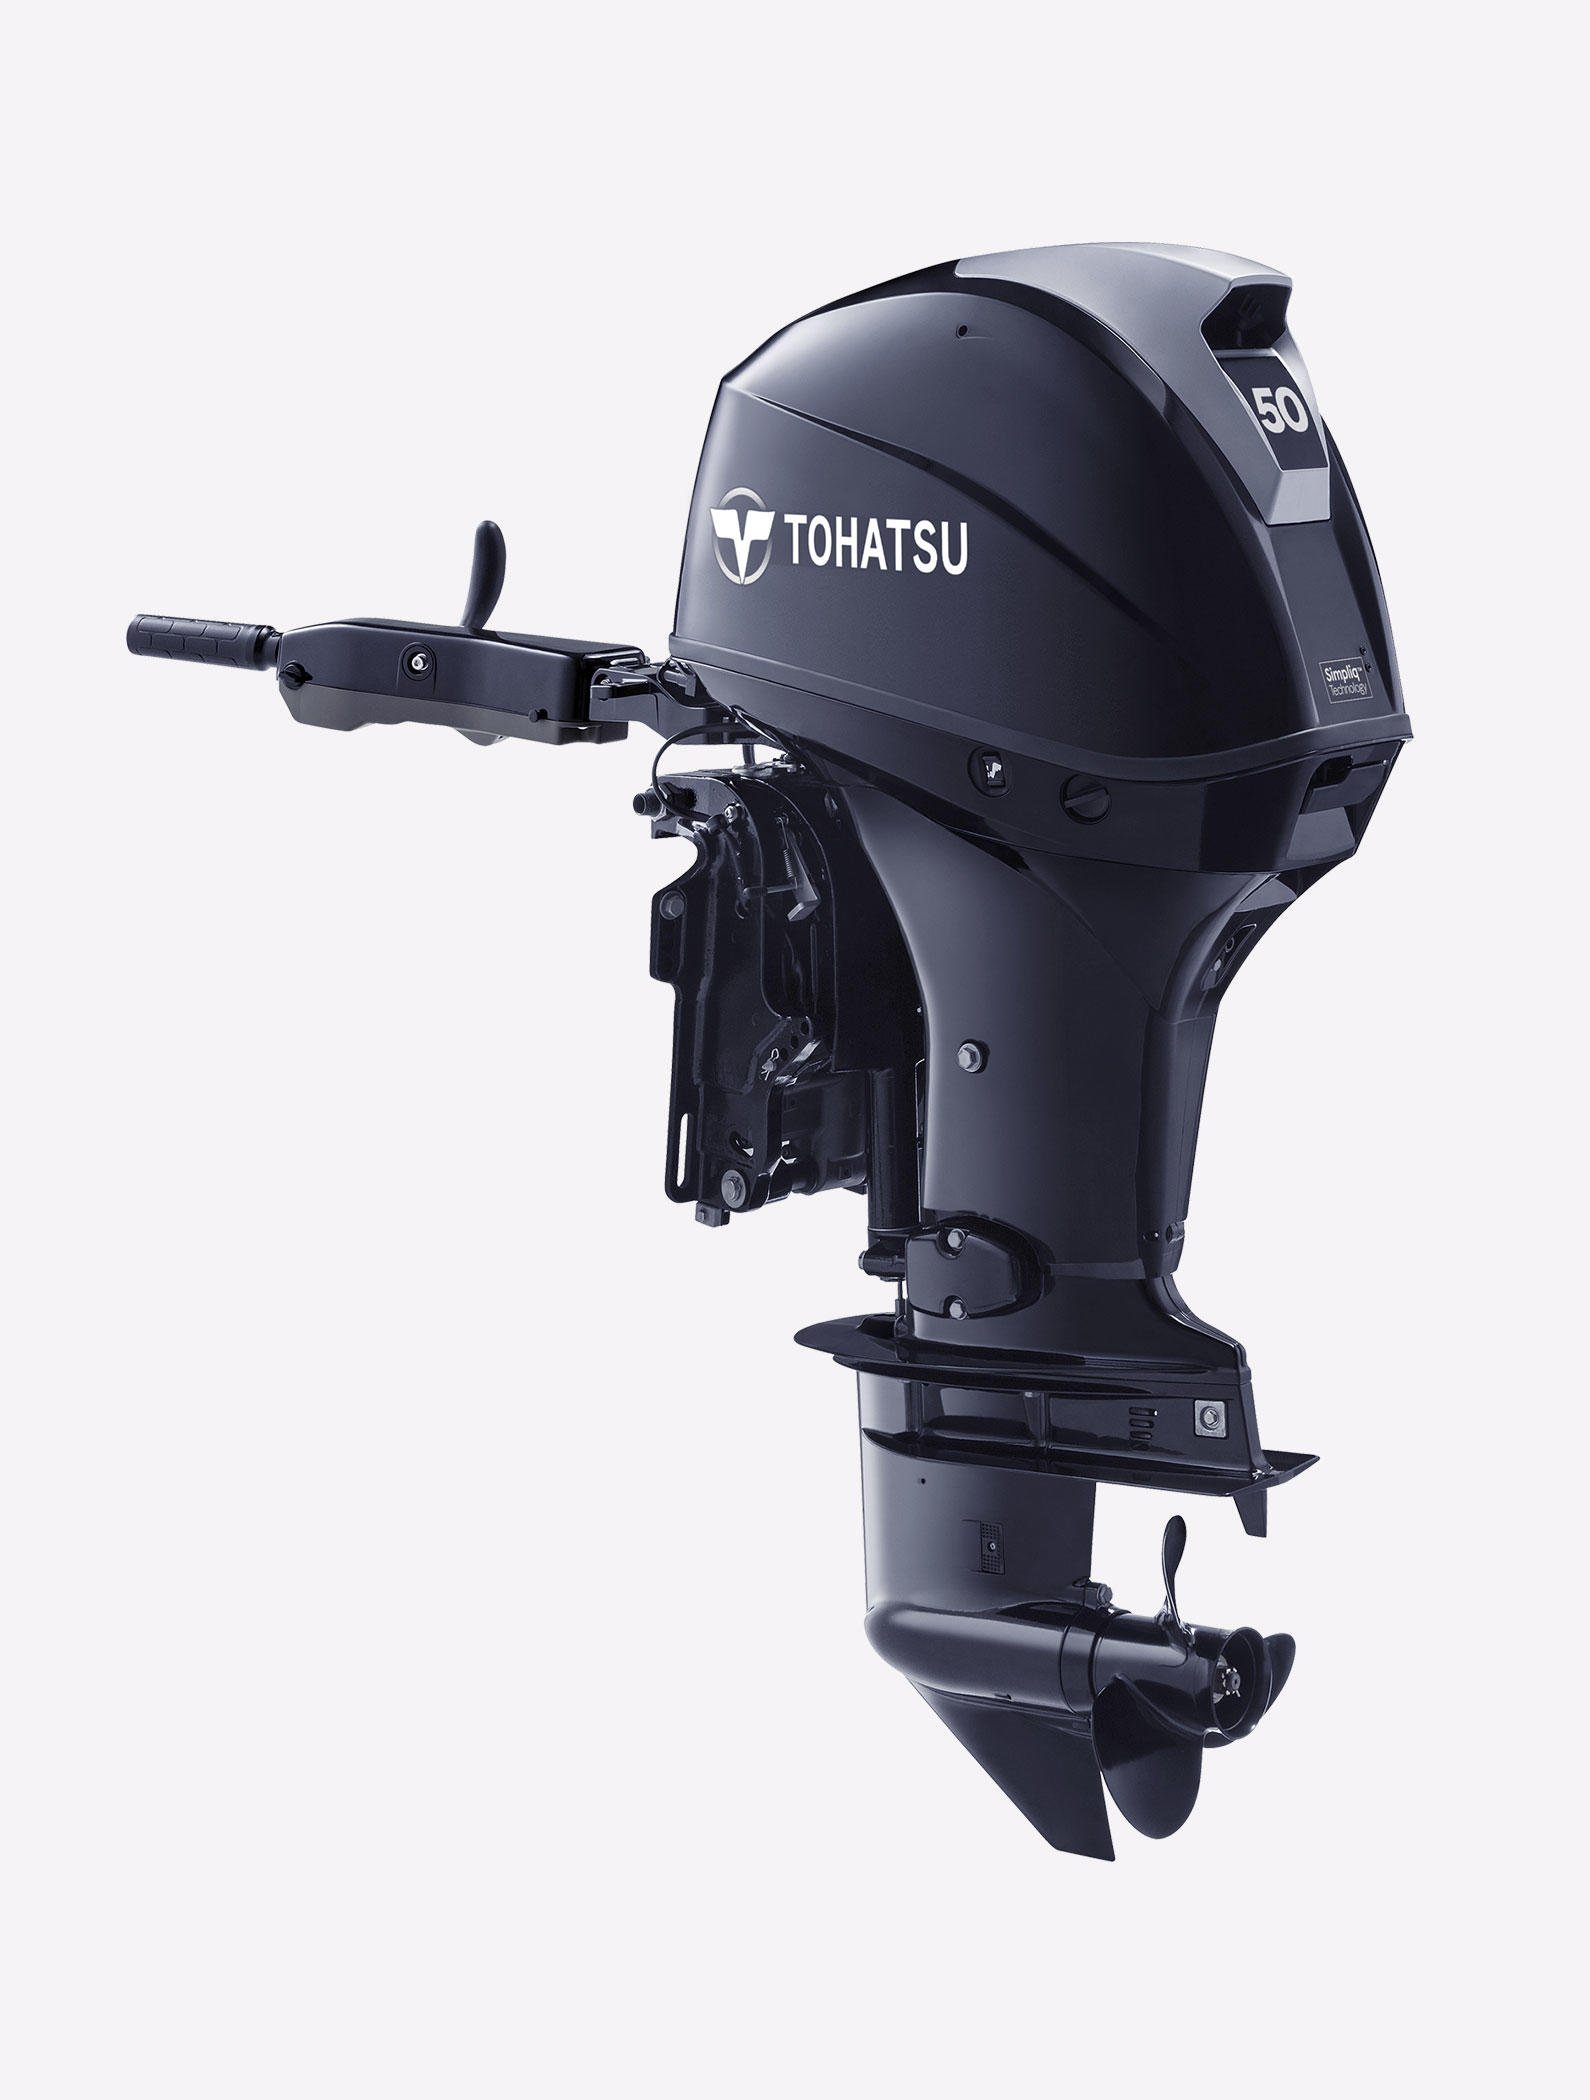 New 2018 Tohatsu MFS50AETL 50 hp Four Stroke EFI Outboard Motor